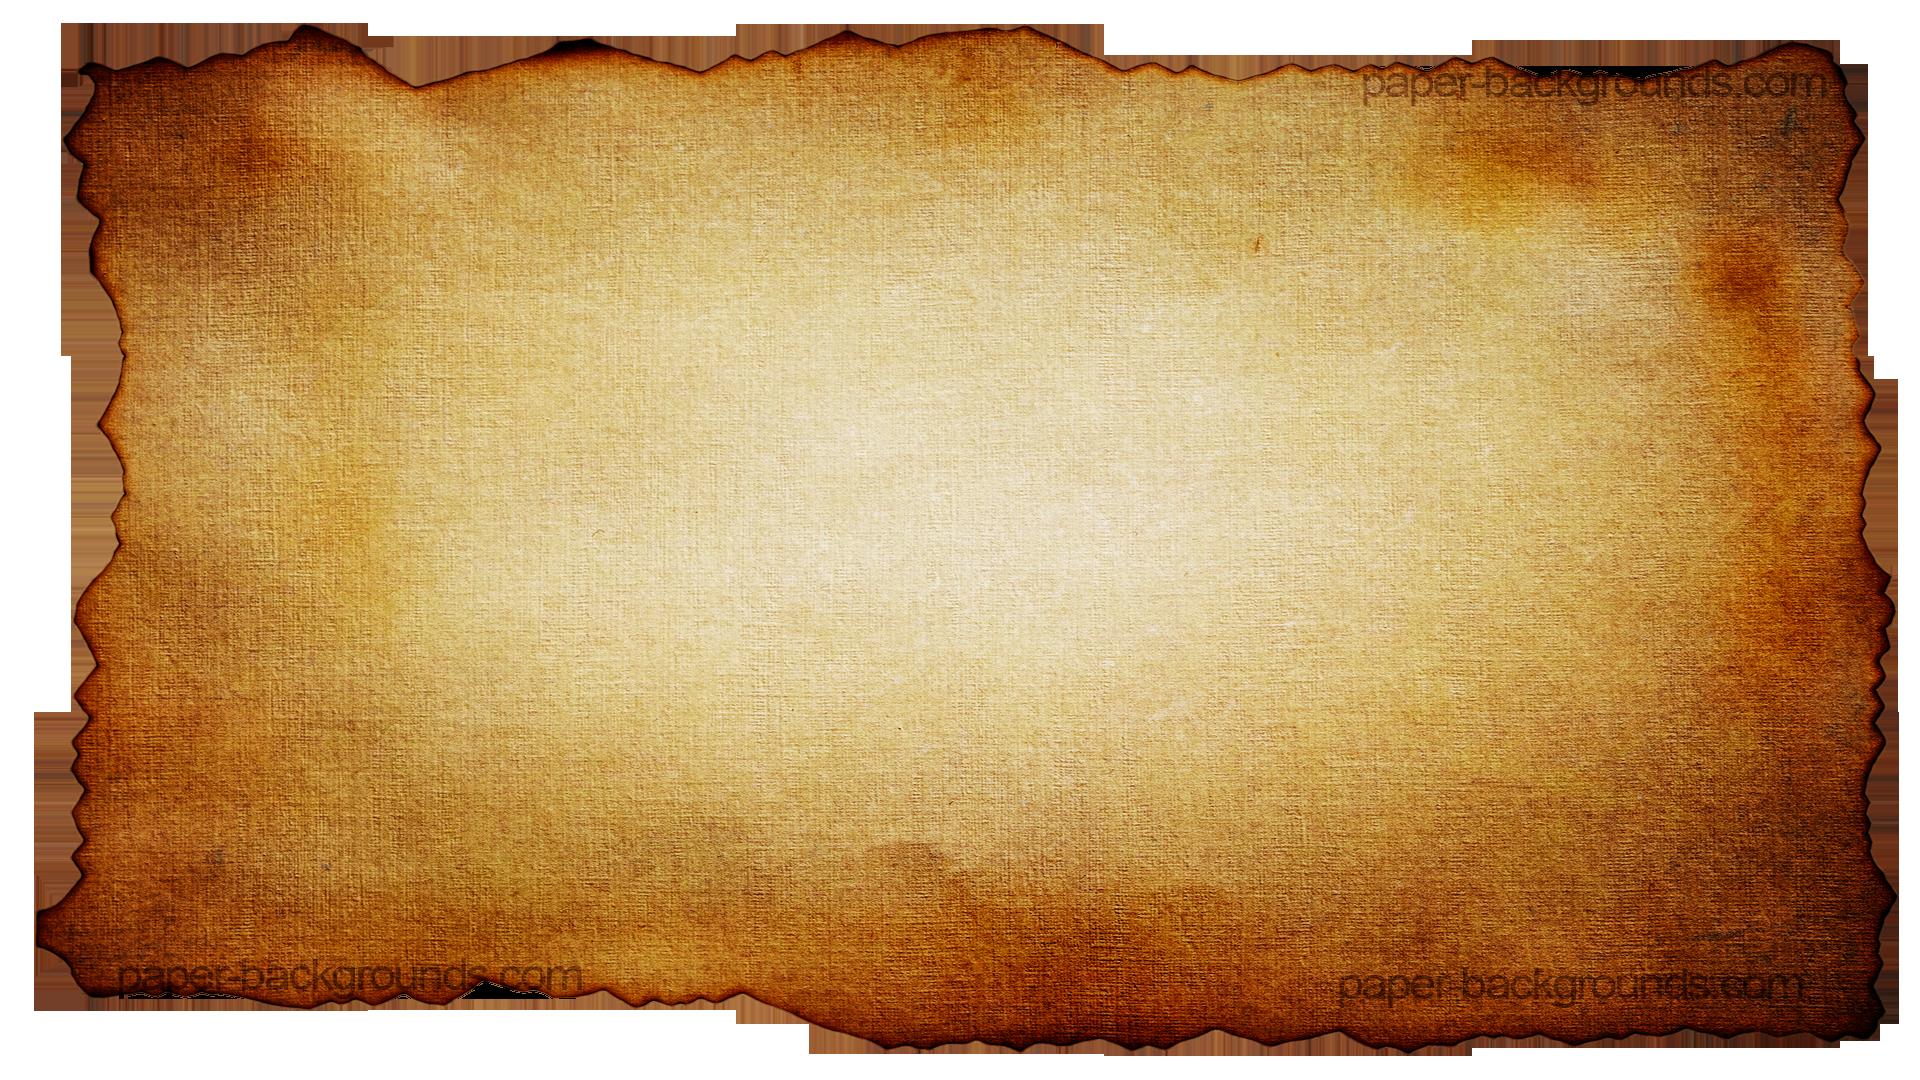 Old Burned Vintage Paper Texture Hd Paper Backgrounds Vintage Paper Textures Paper Texture Vintage Paper Background